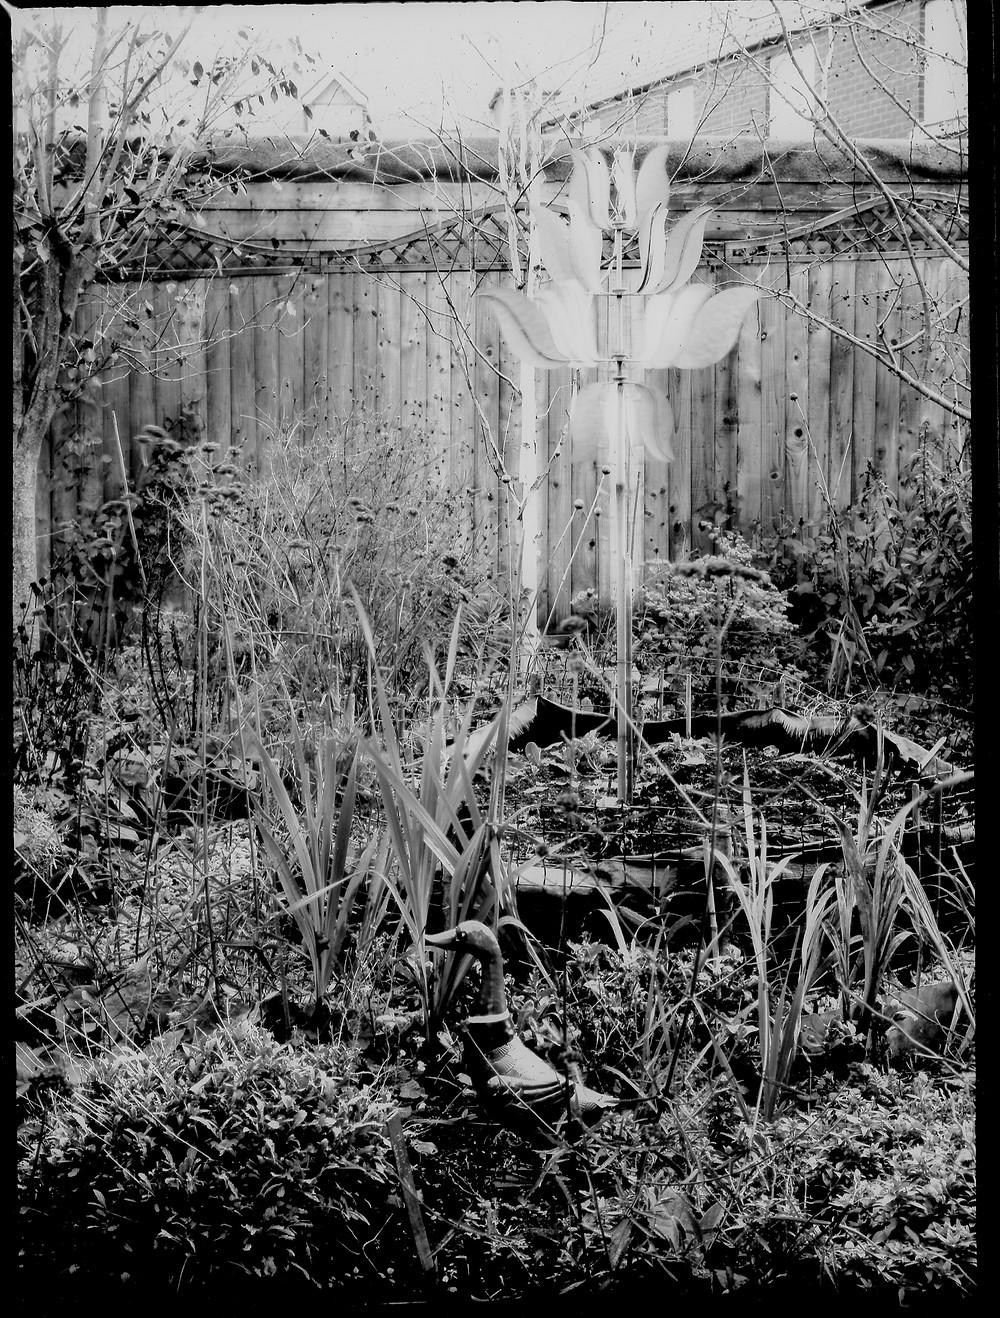 HalfPlate-photo-Garden1